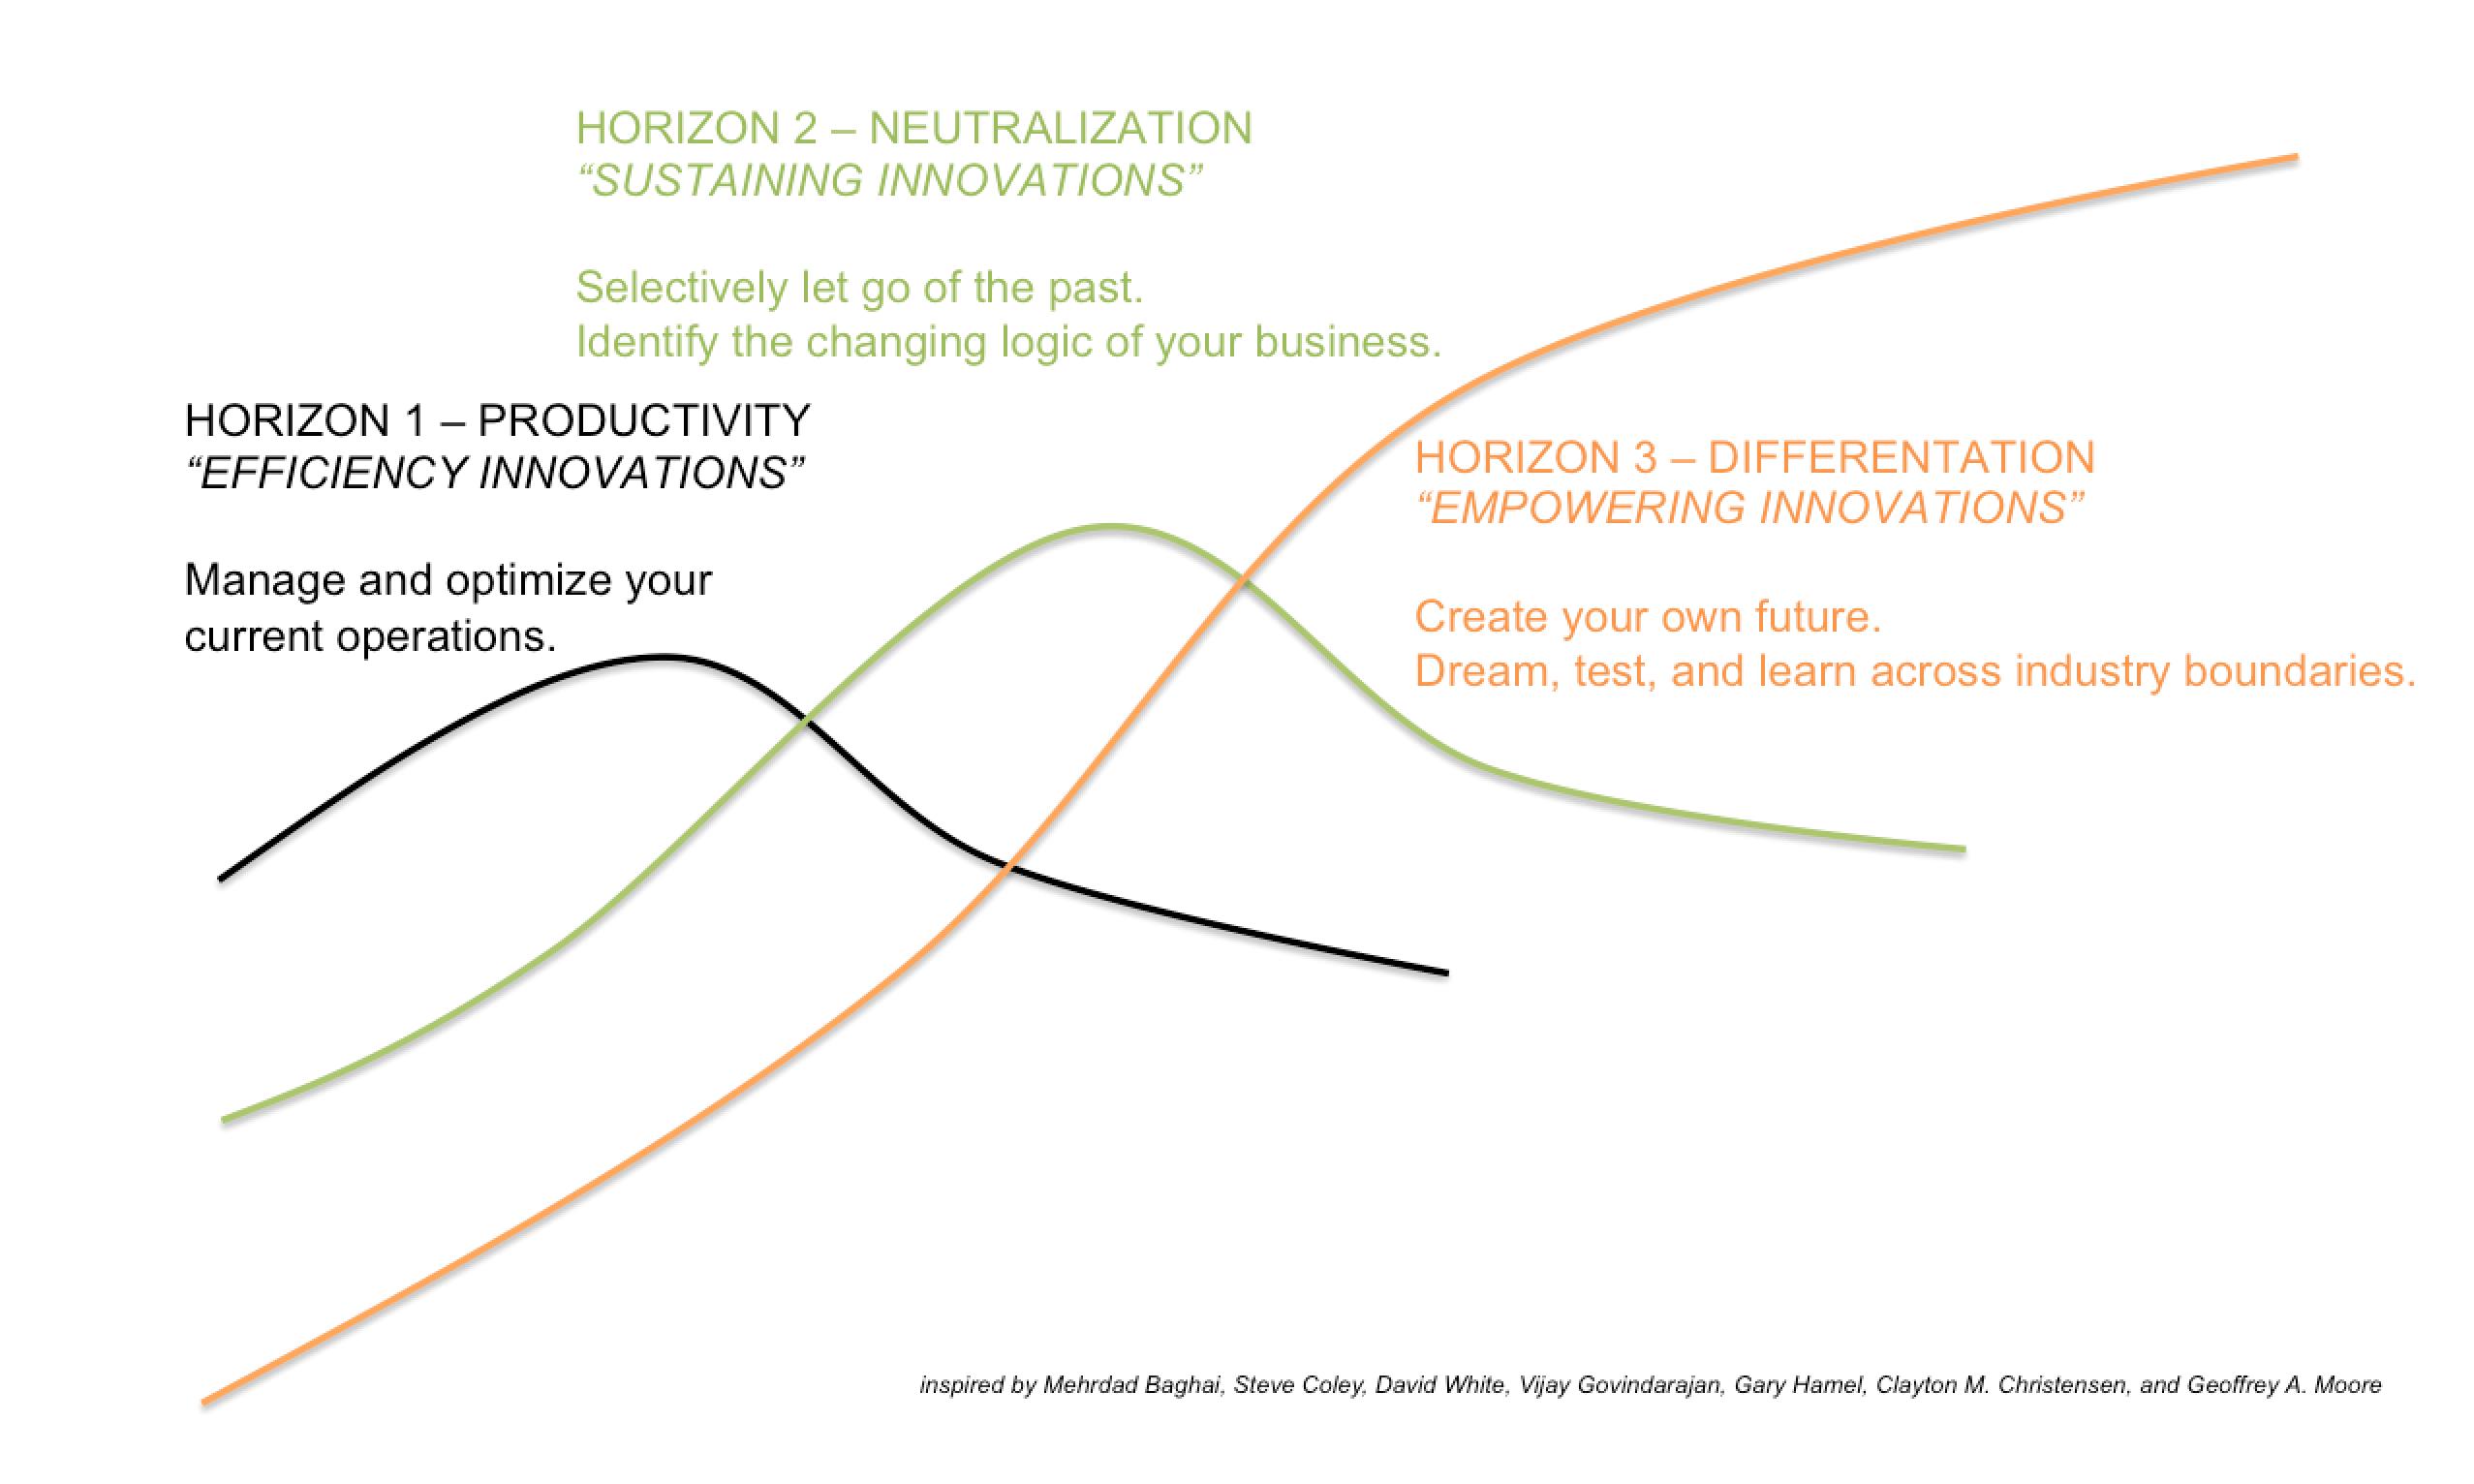 The three horizons explained